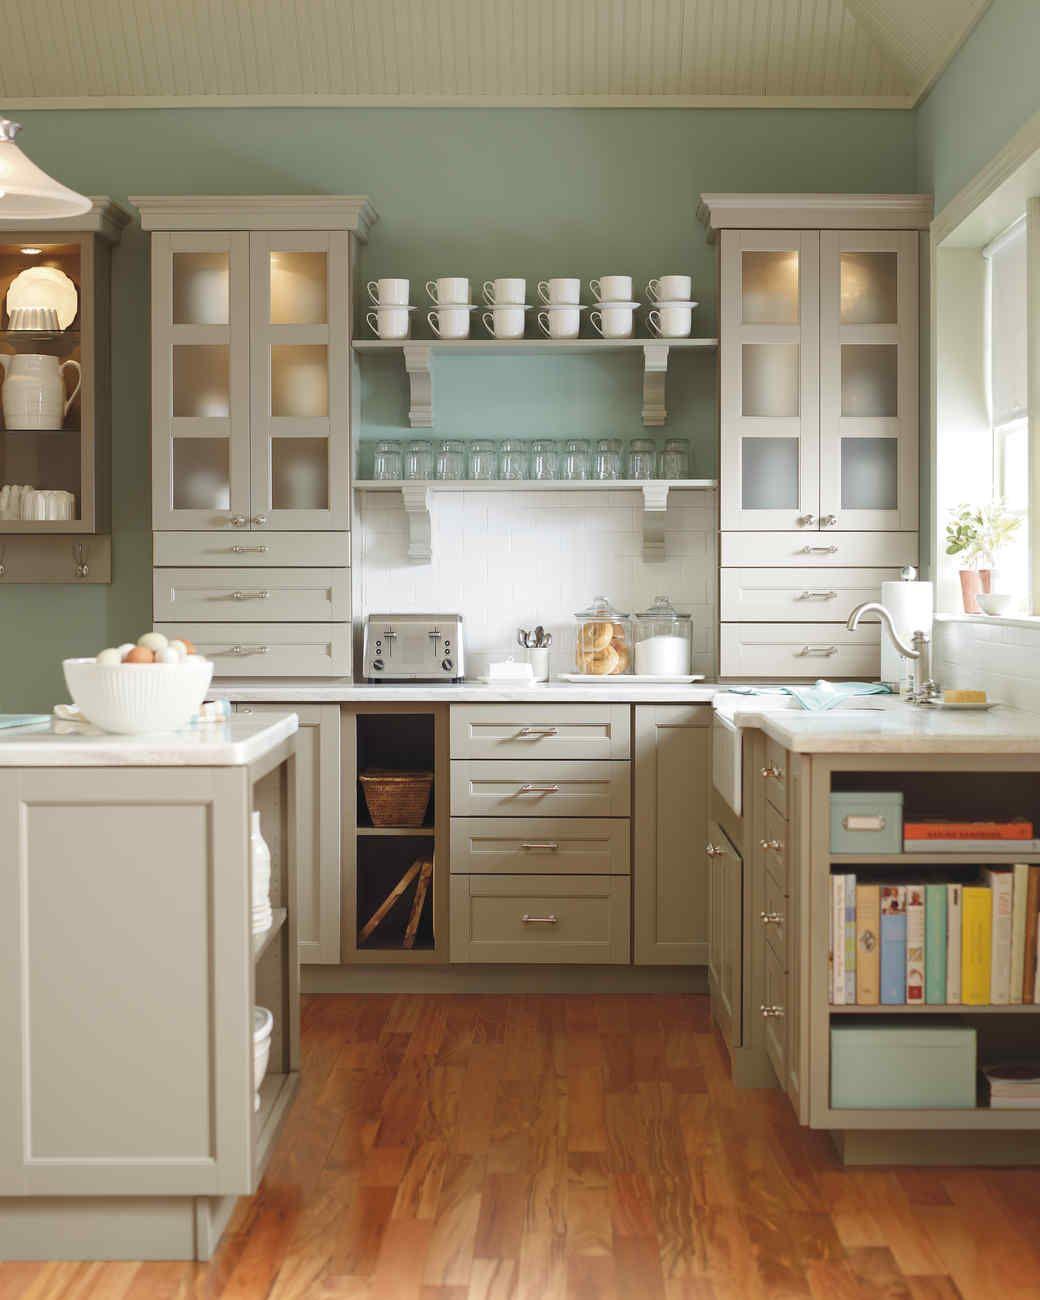 How To Pick Kitchen Paint Colors Kitchen Inspirations Martha Stewart Living Kitchen Martha Stewart Kitchen